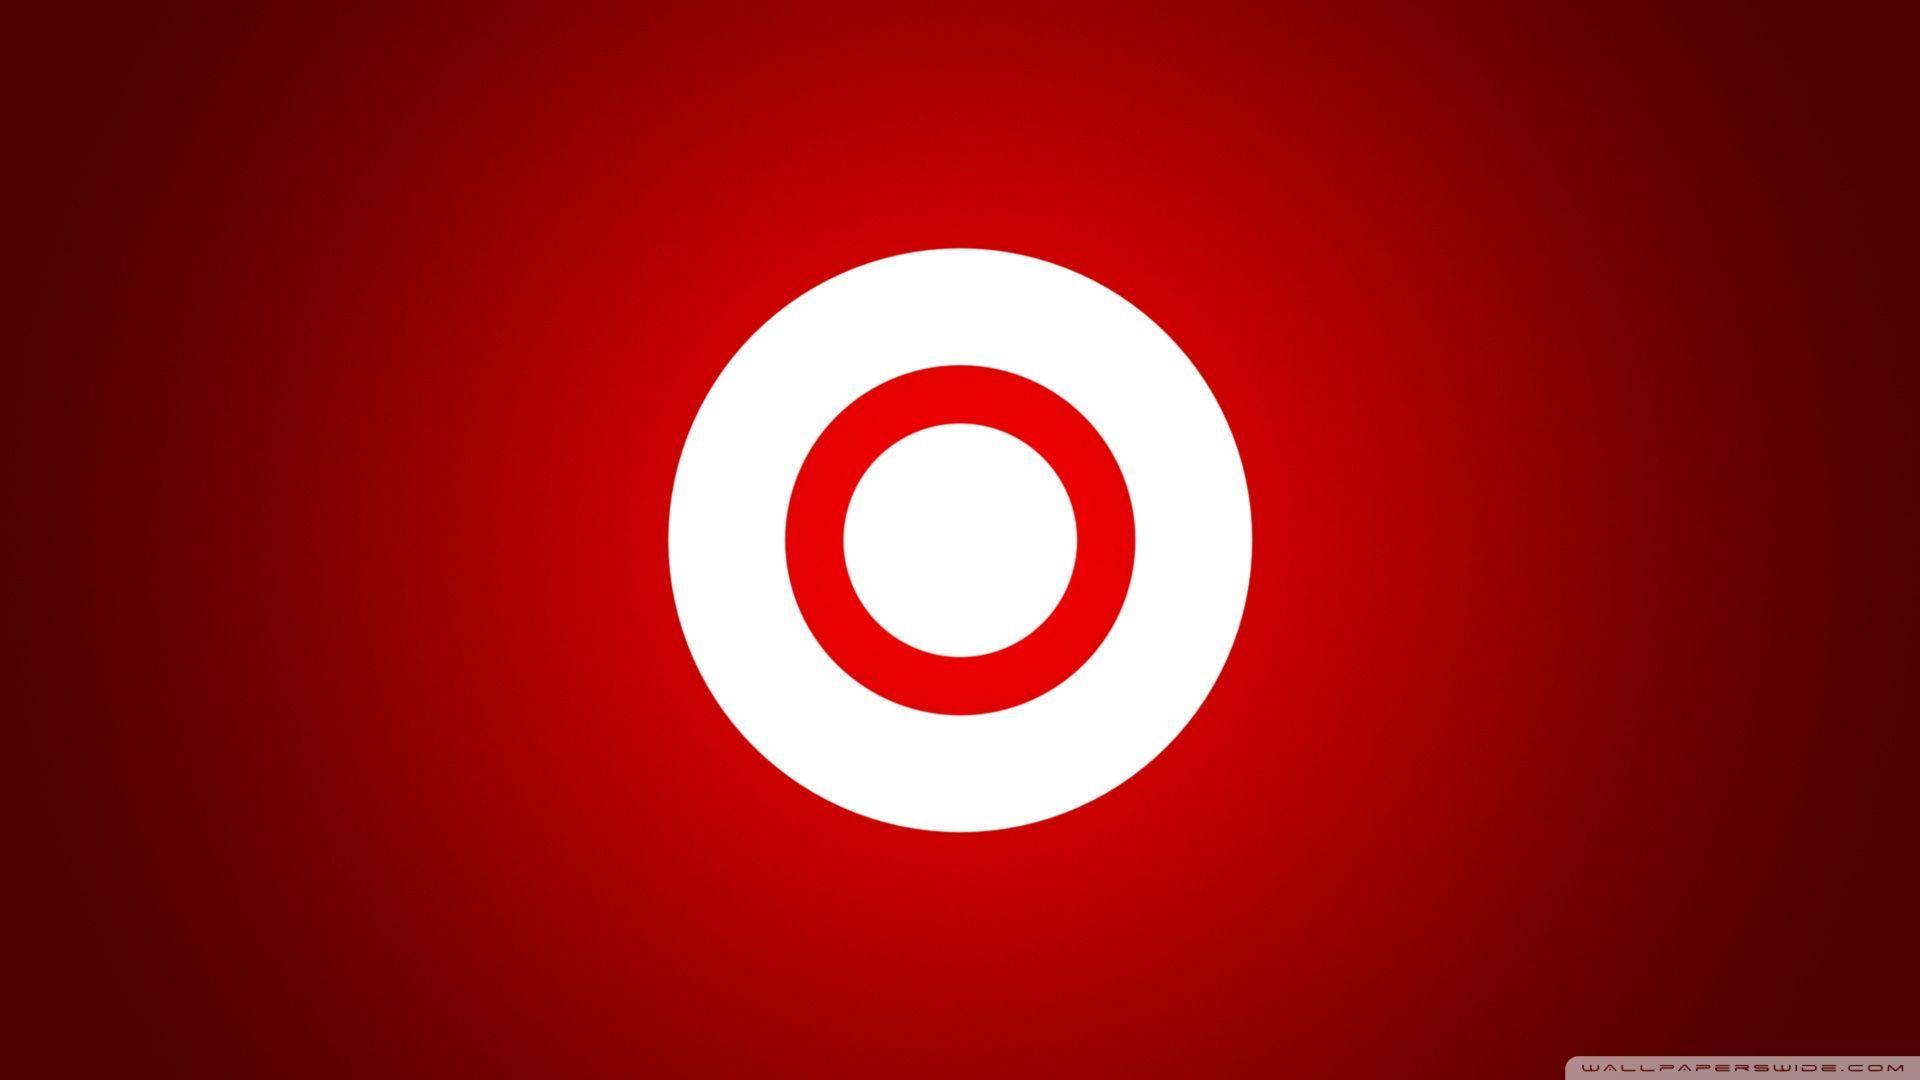 Target Wallpapers Top Free Target Backgrounds Wallpaperaccess